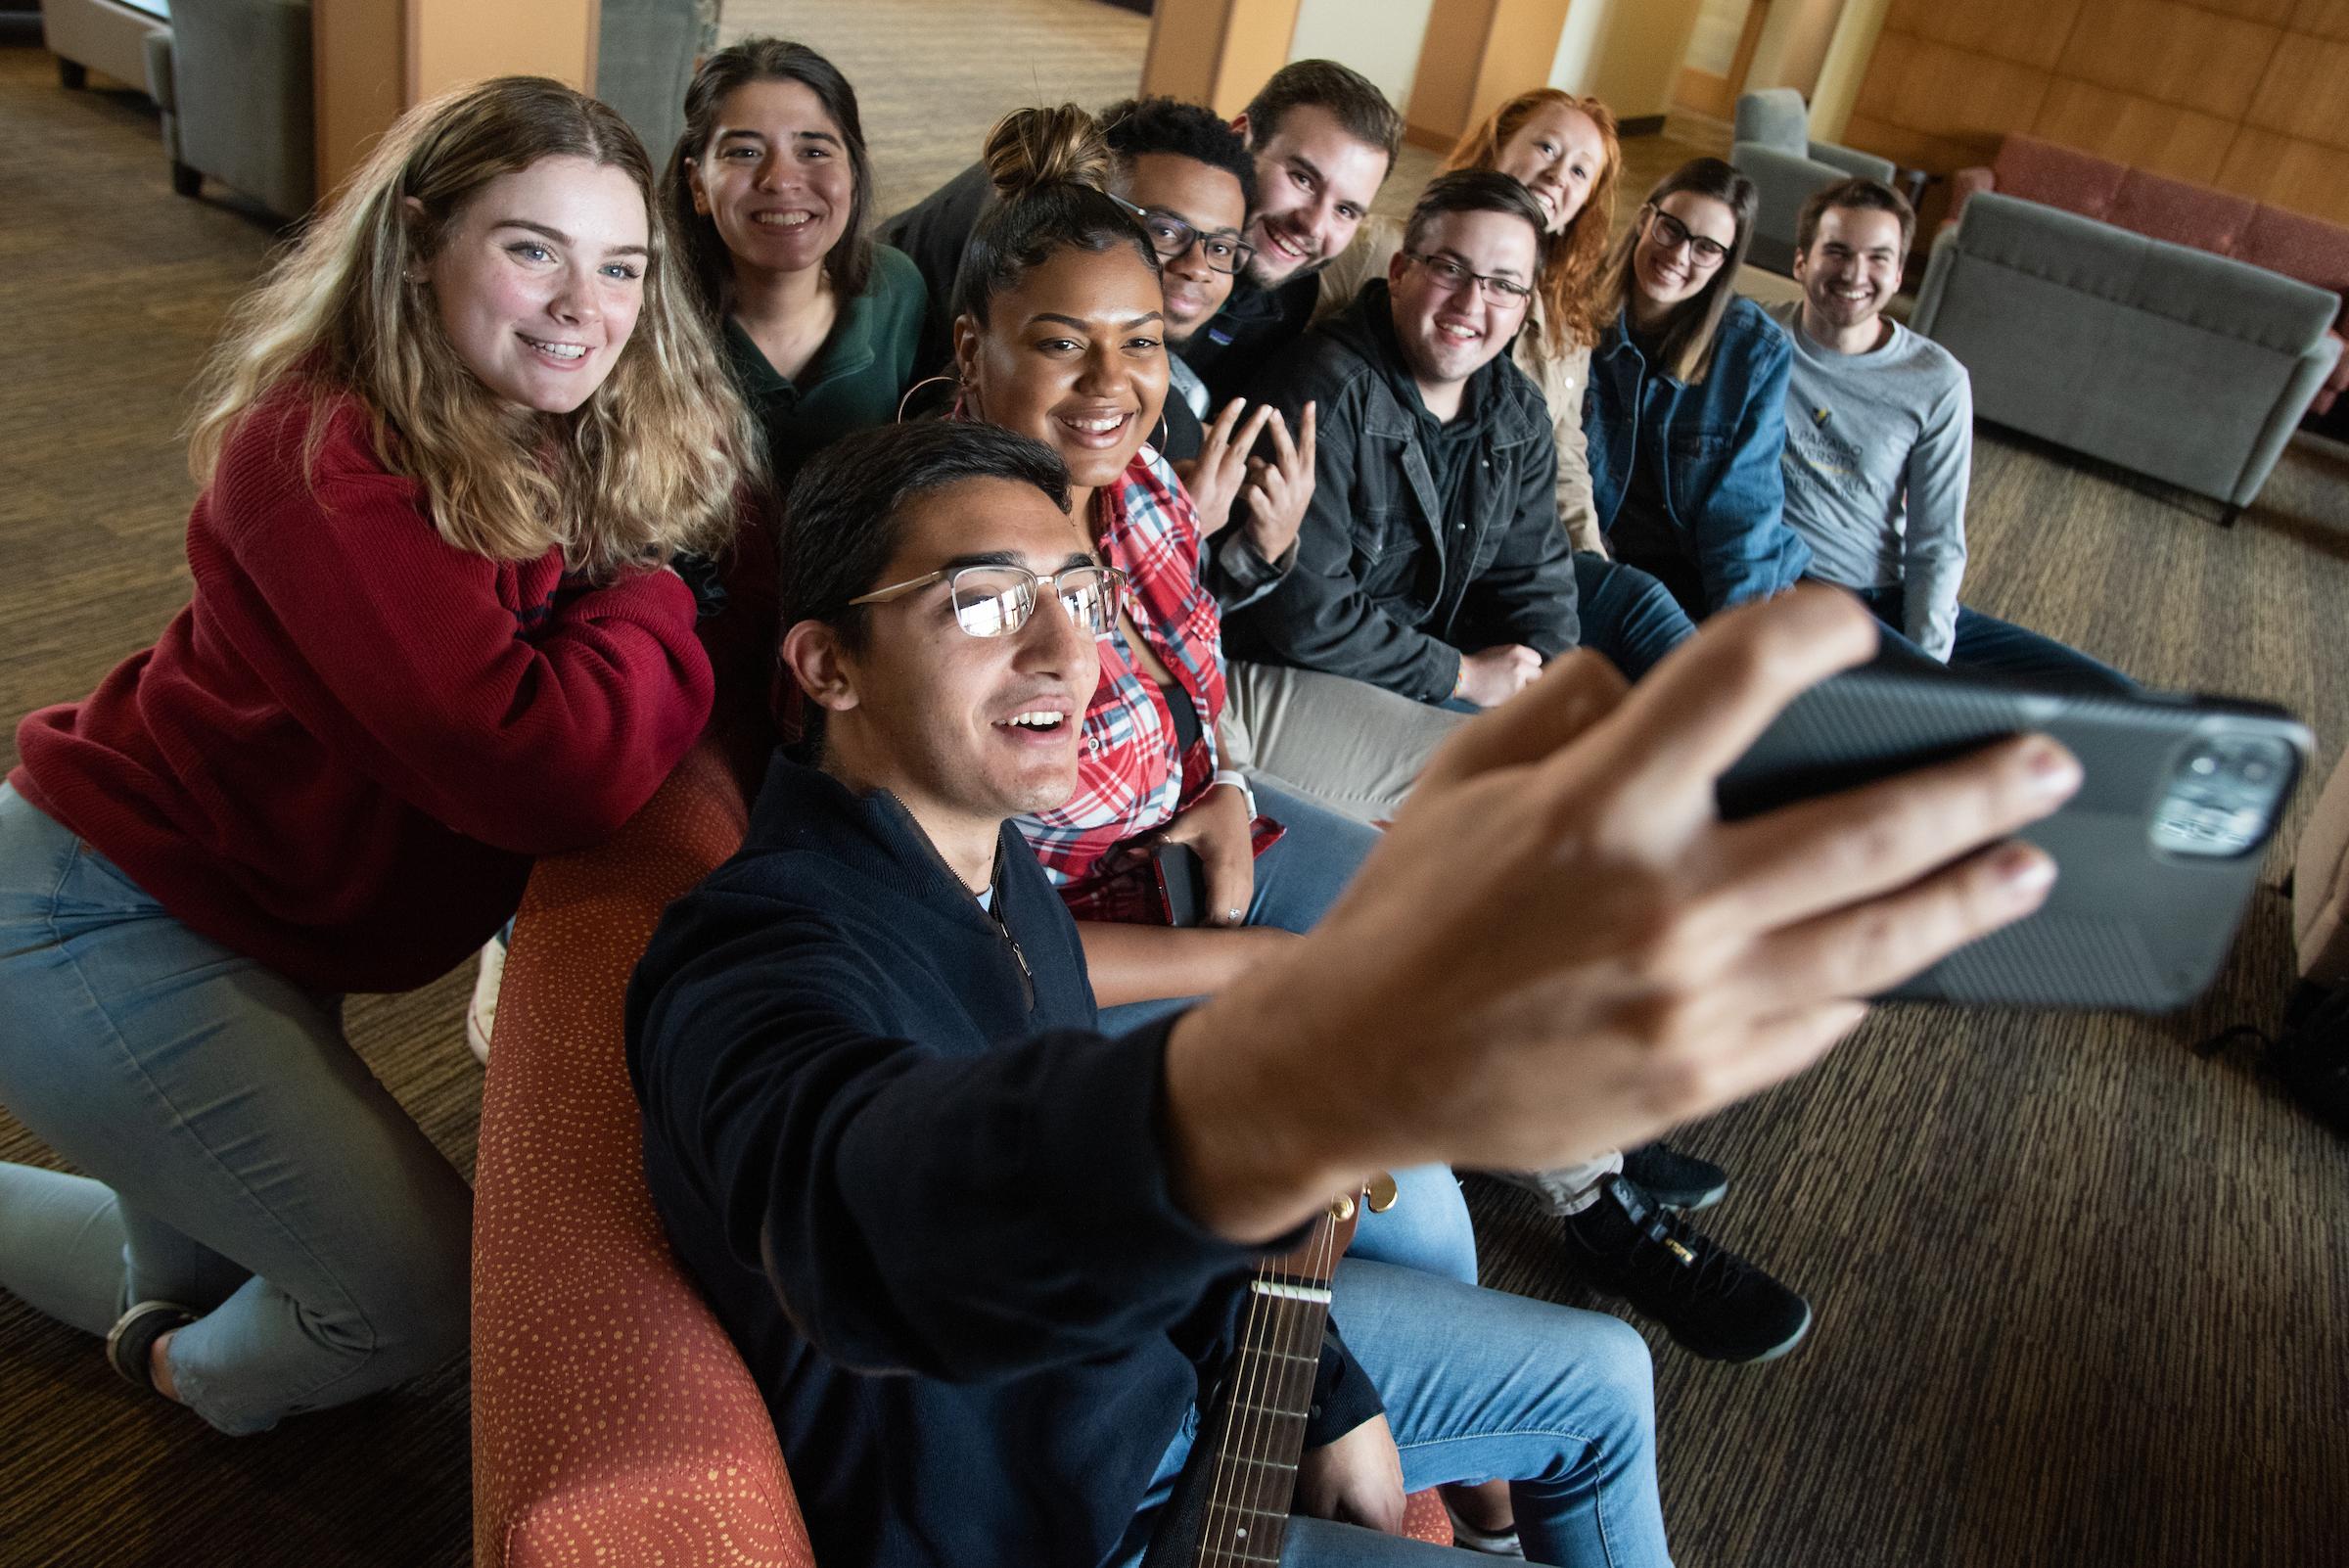 Residence Hall Group selfie